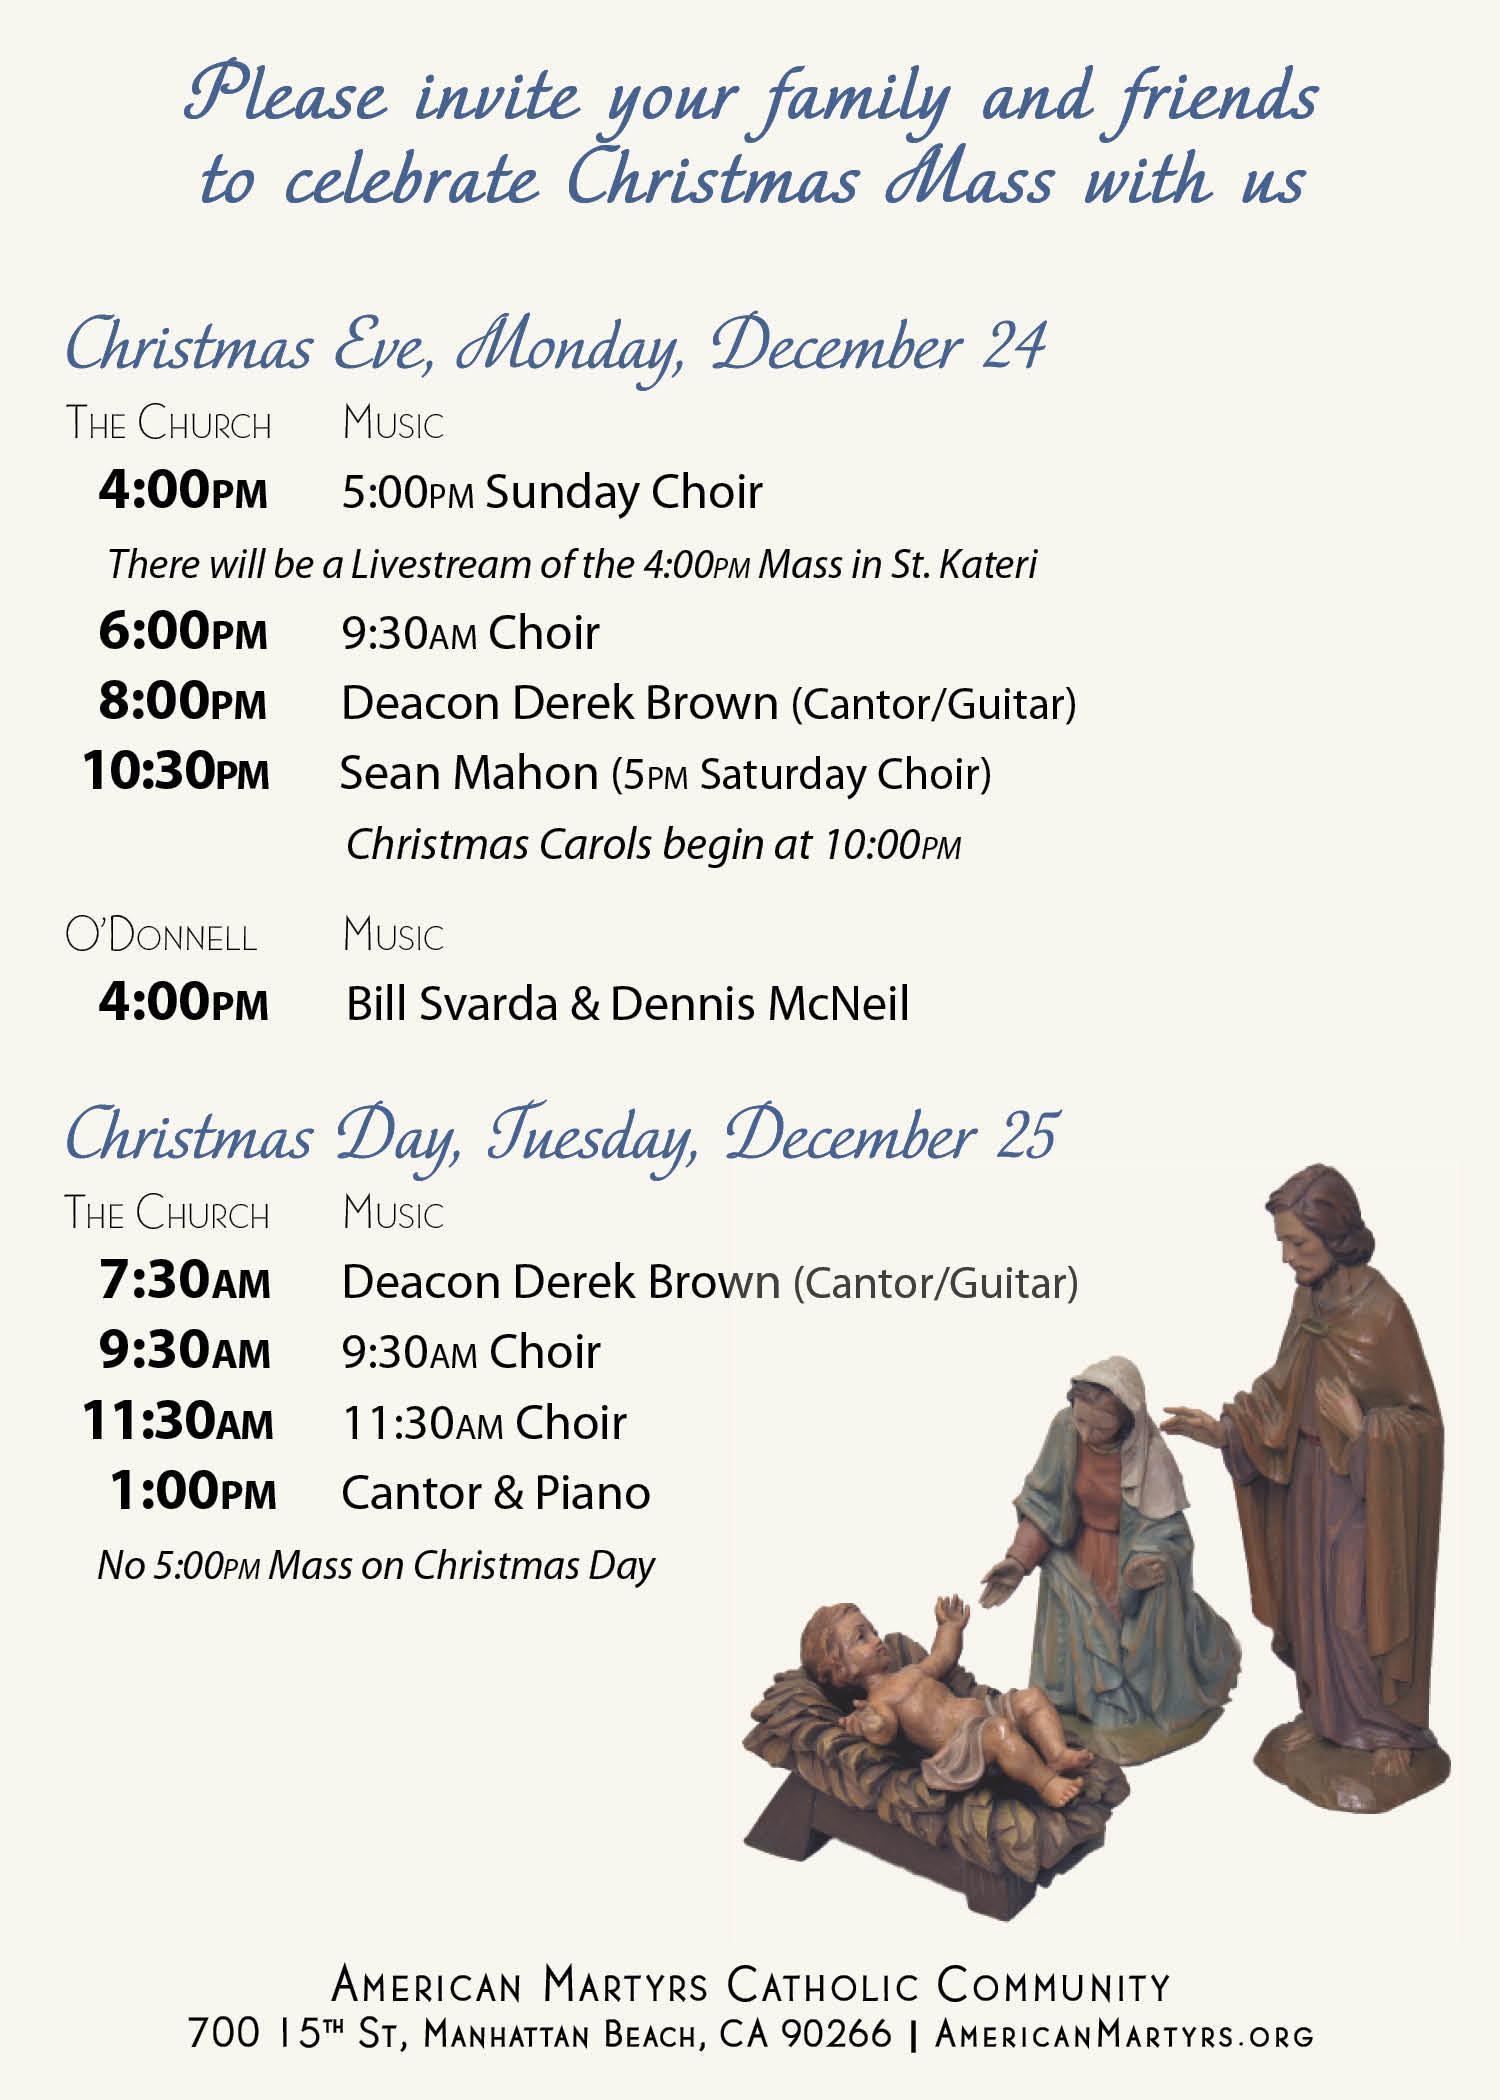 Christmas Mass Schedule Image